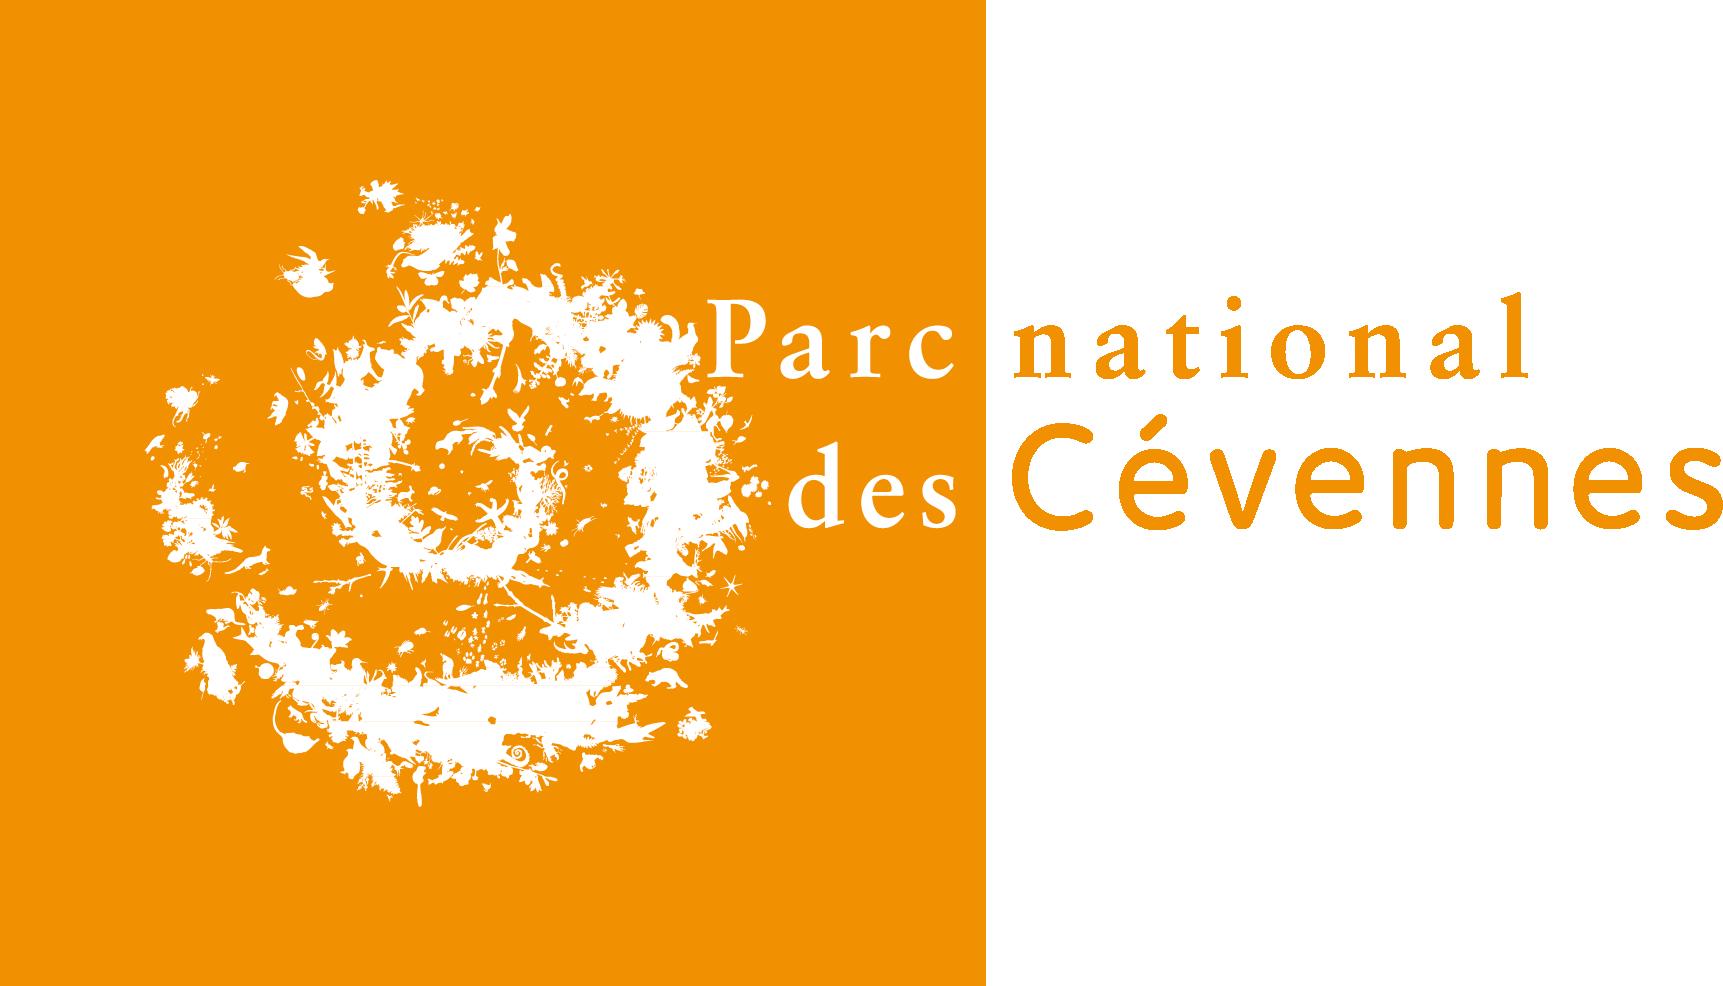 https://cd1.cevennes-parcnational.net/img_folder/logo_PNC_txt_orange.png